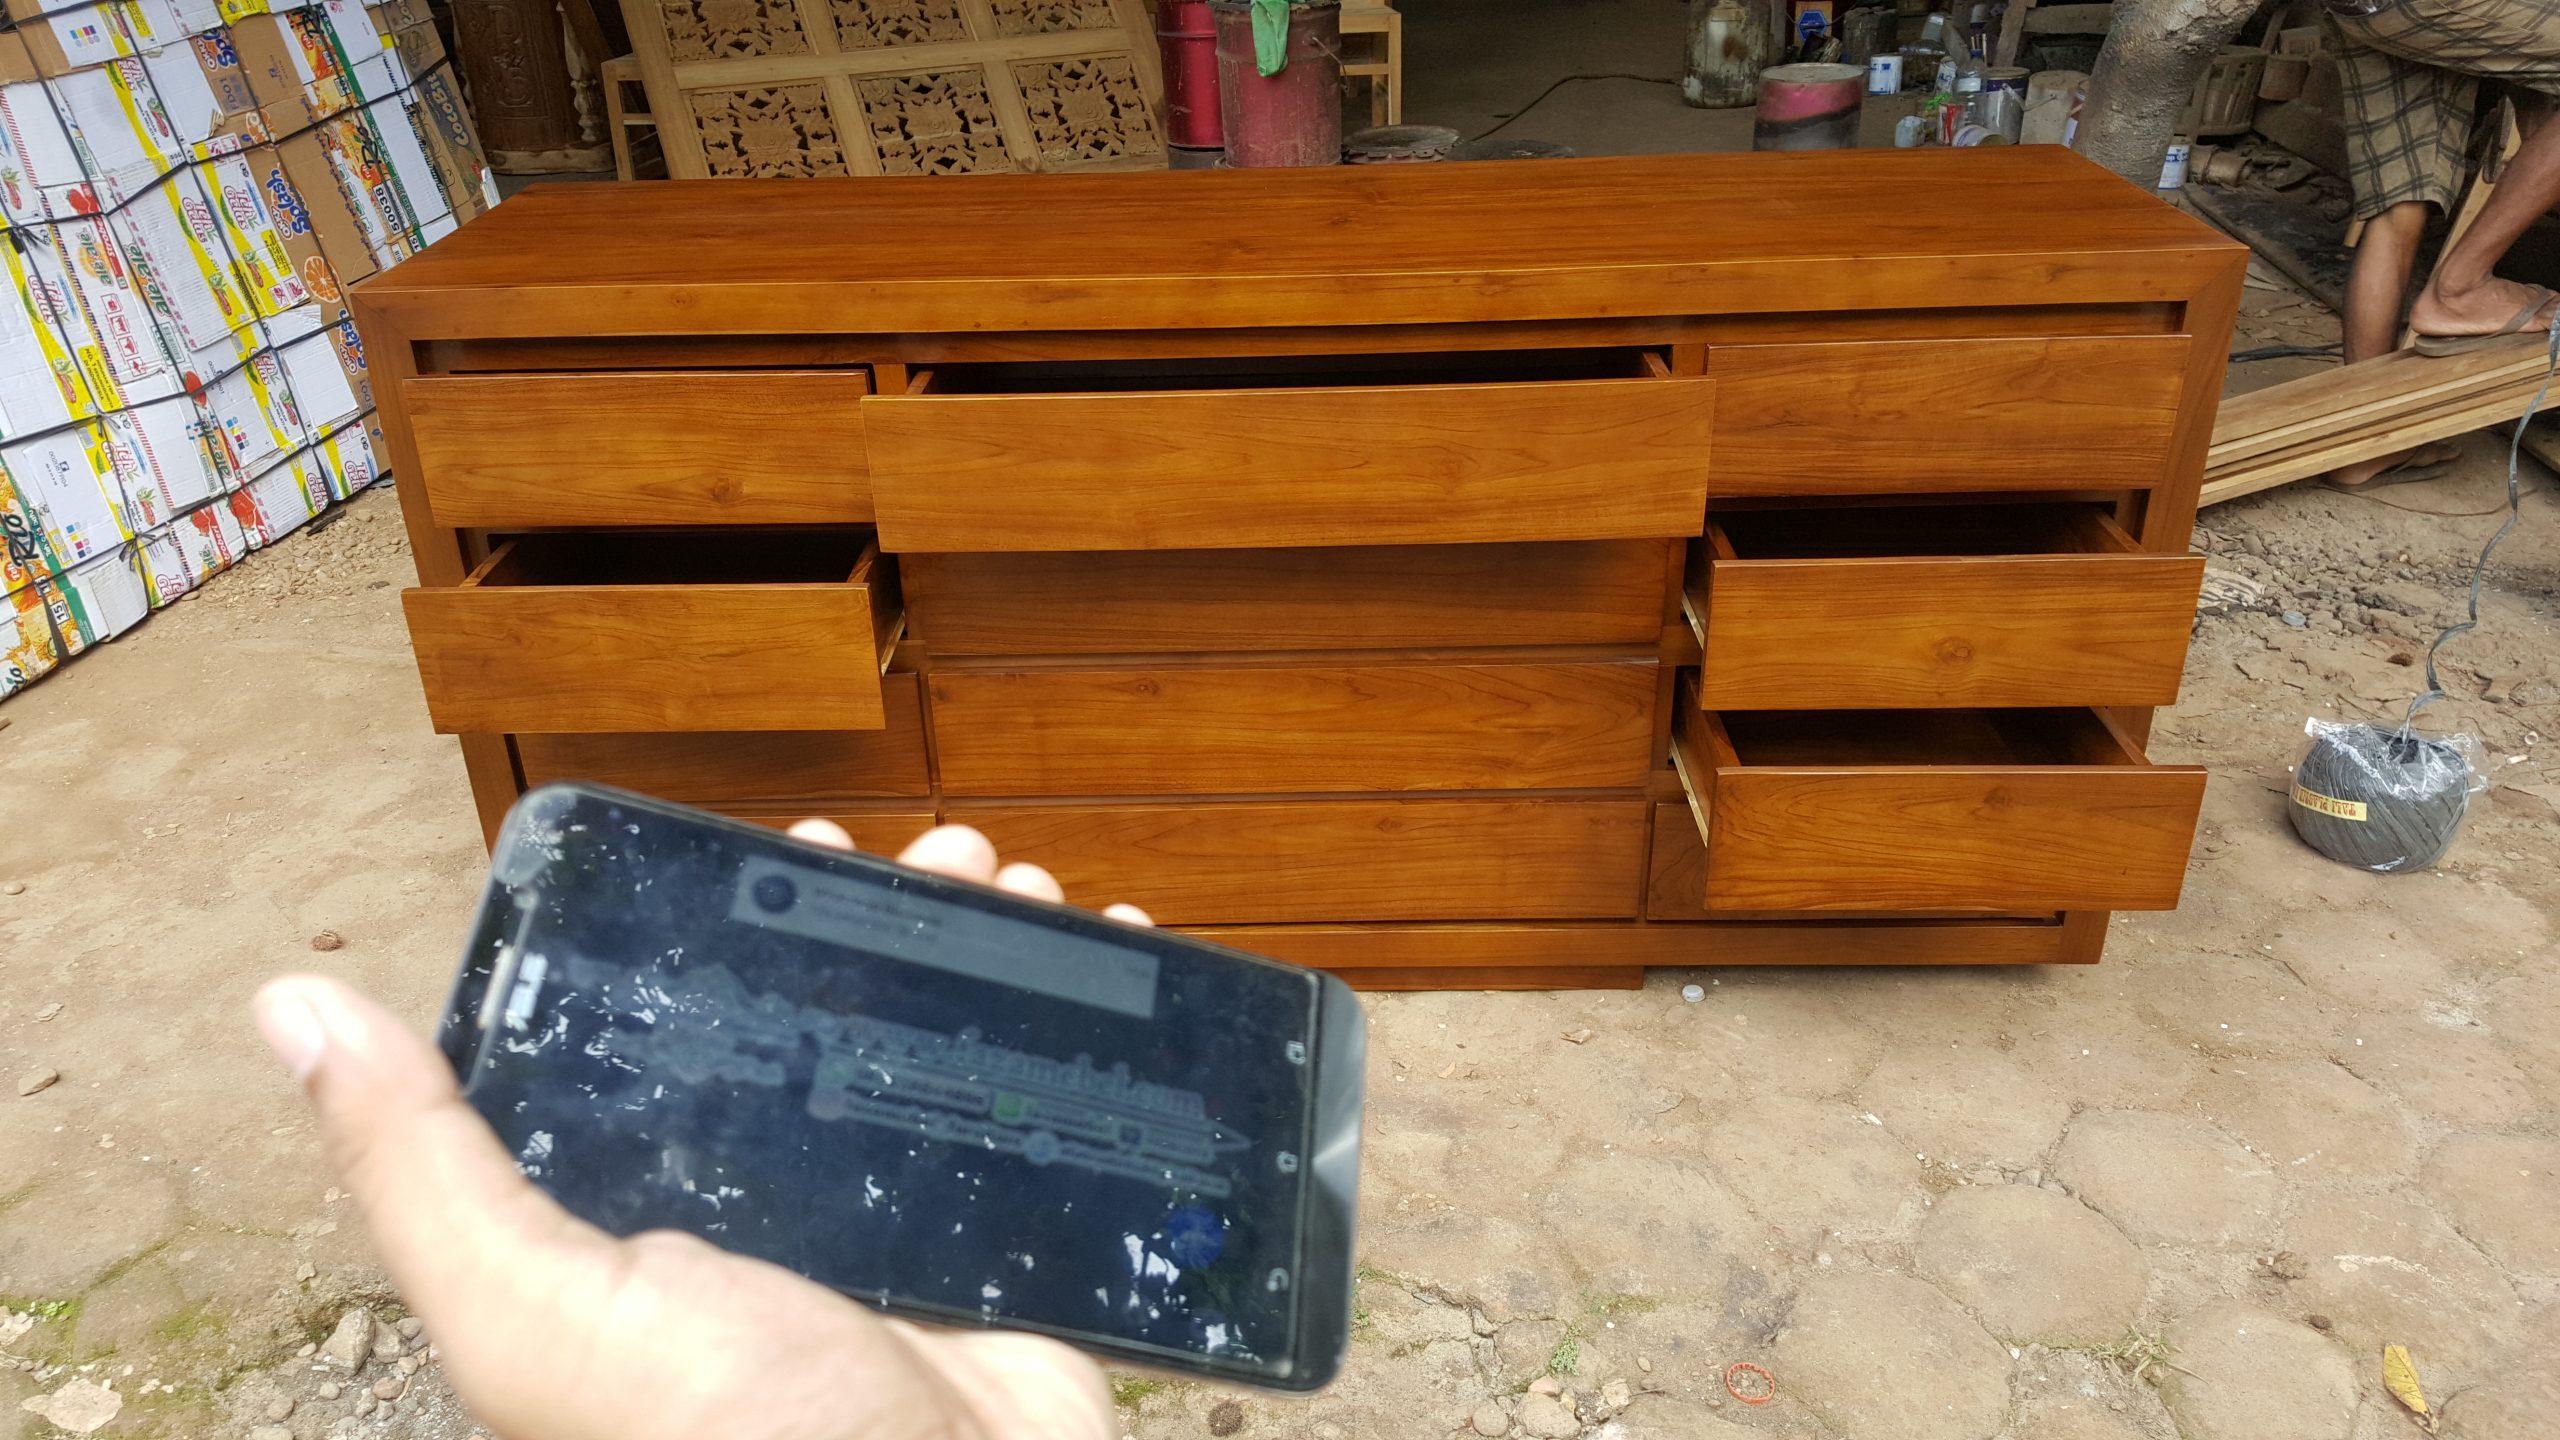 tempat-tidur-set-kayu-jati-mewah-ukir-jepara (19)